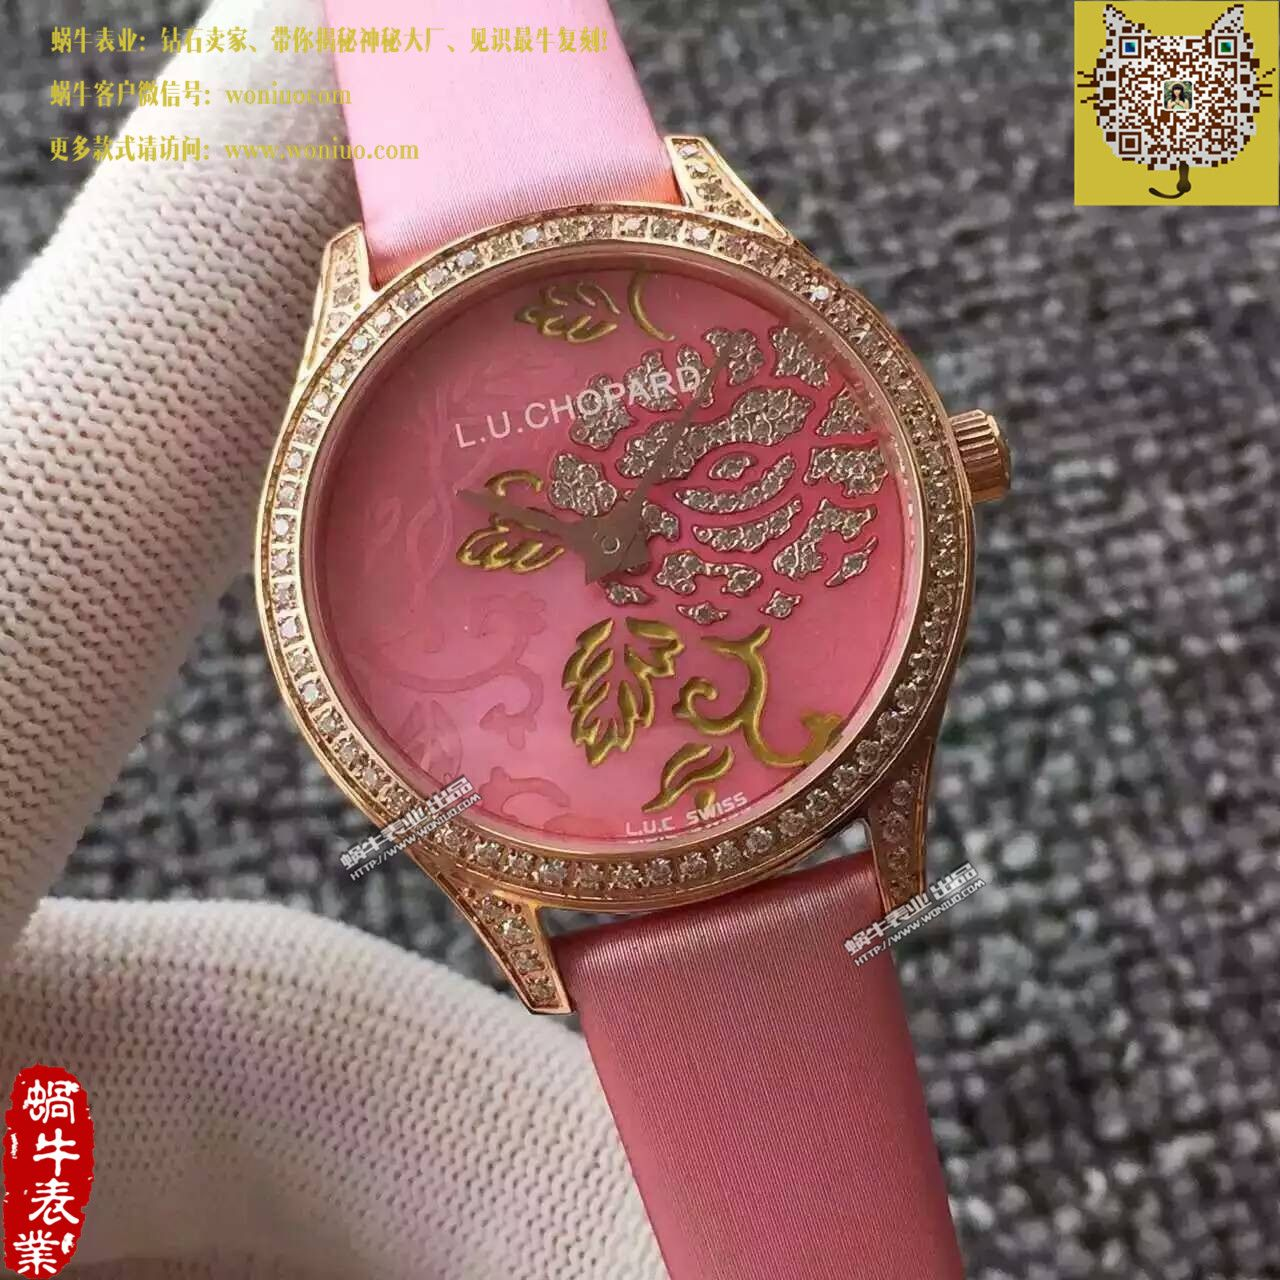 【SF厂一比一超A高仿手表】萧邦L.U.C系列131944-5001女士机械腕表